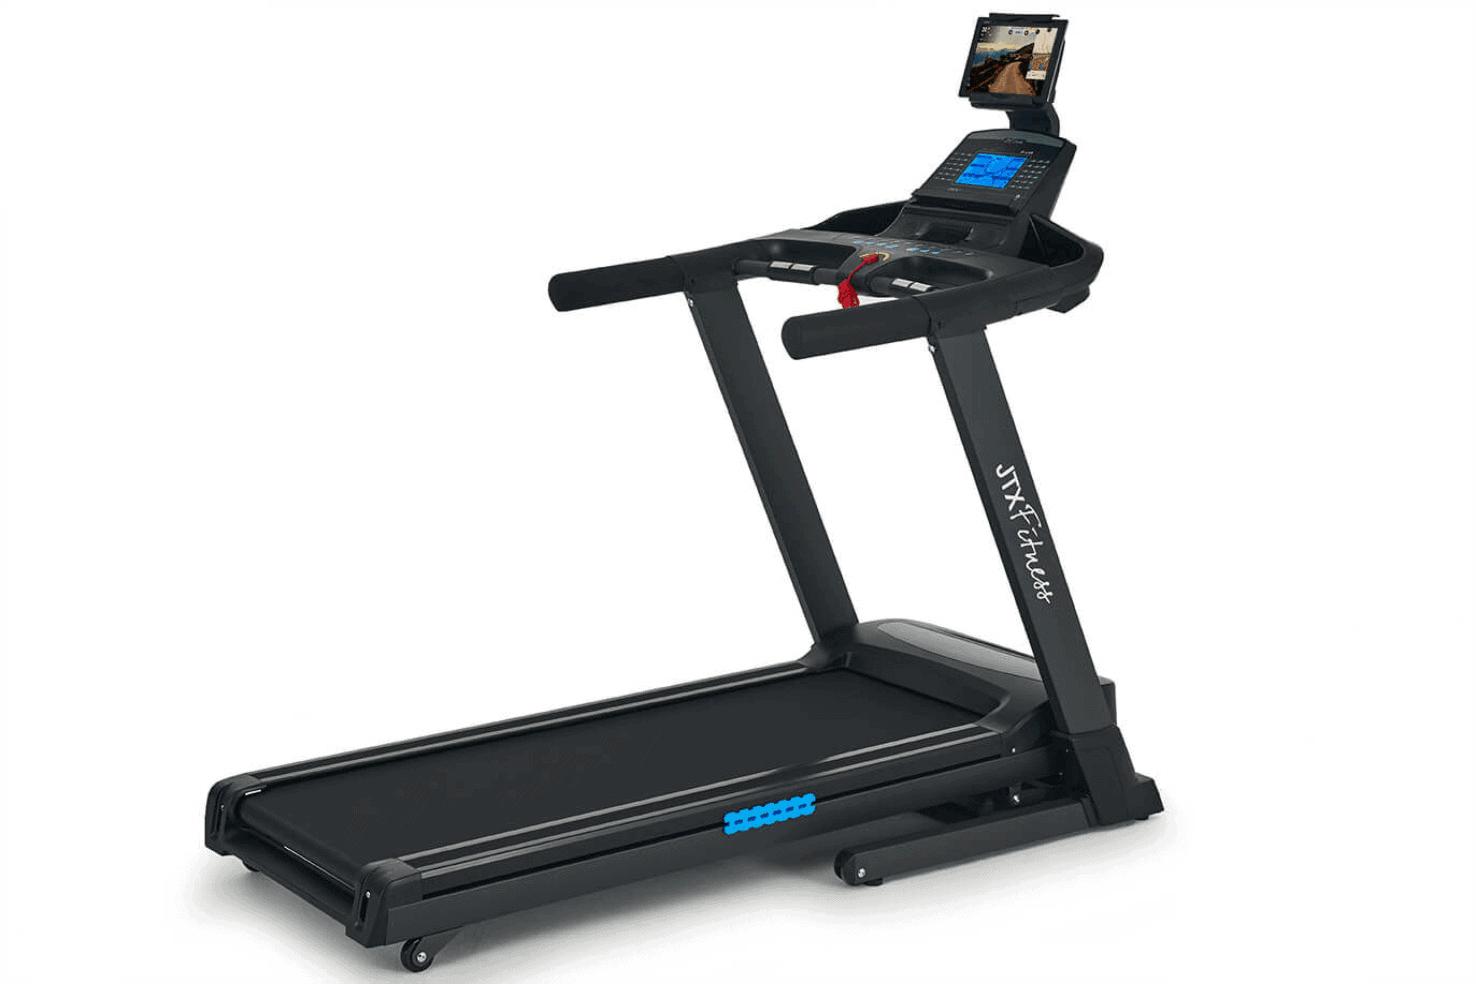 JTX Sprint 7 Treadmill Review